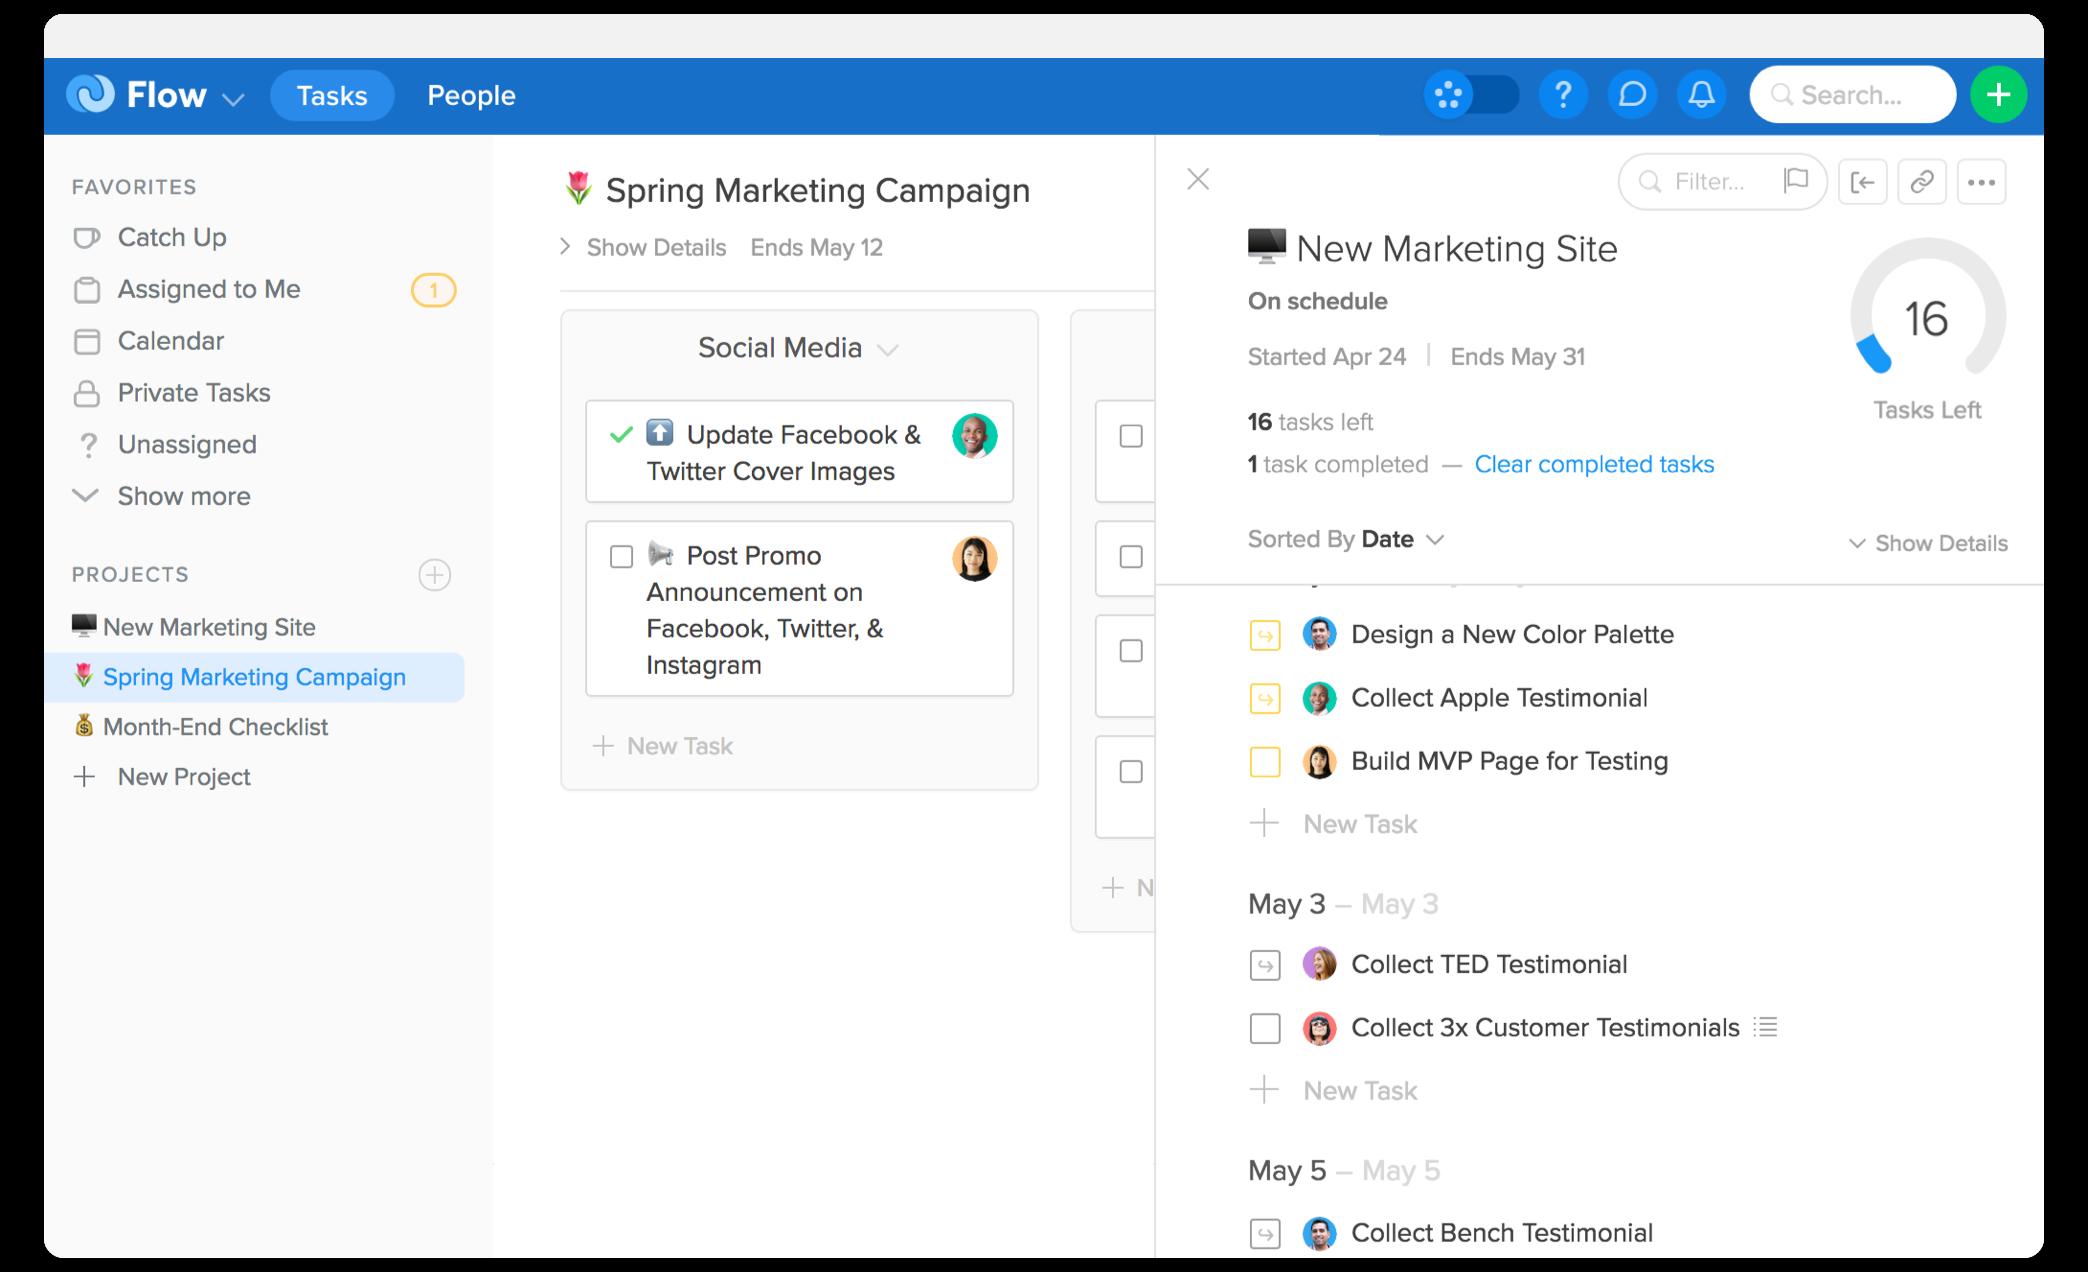 Flow Software - Task tracking